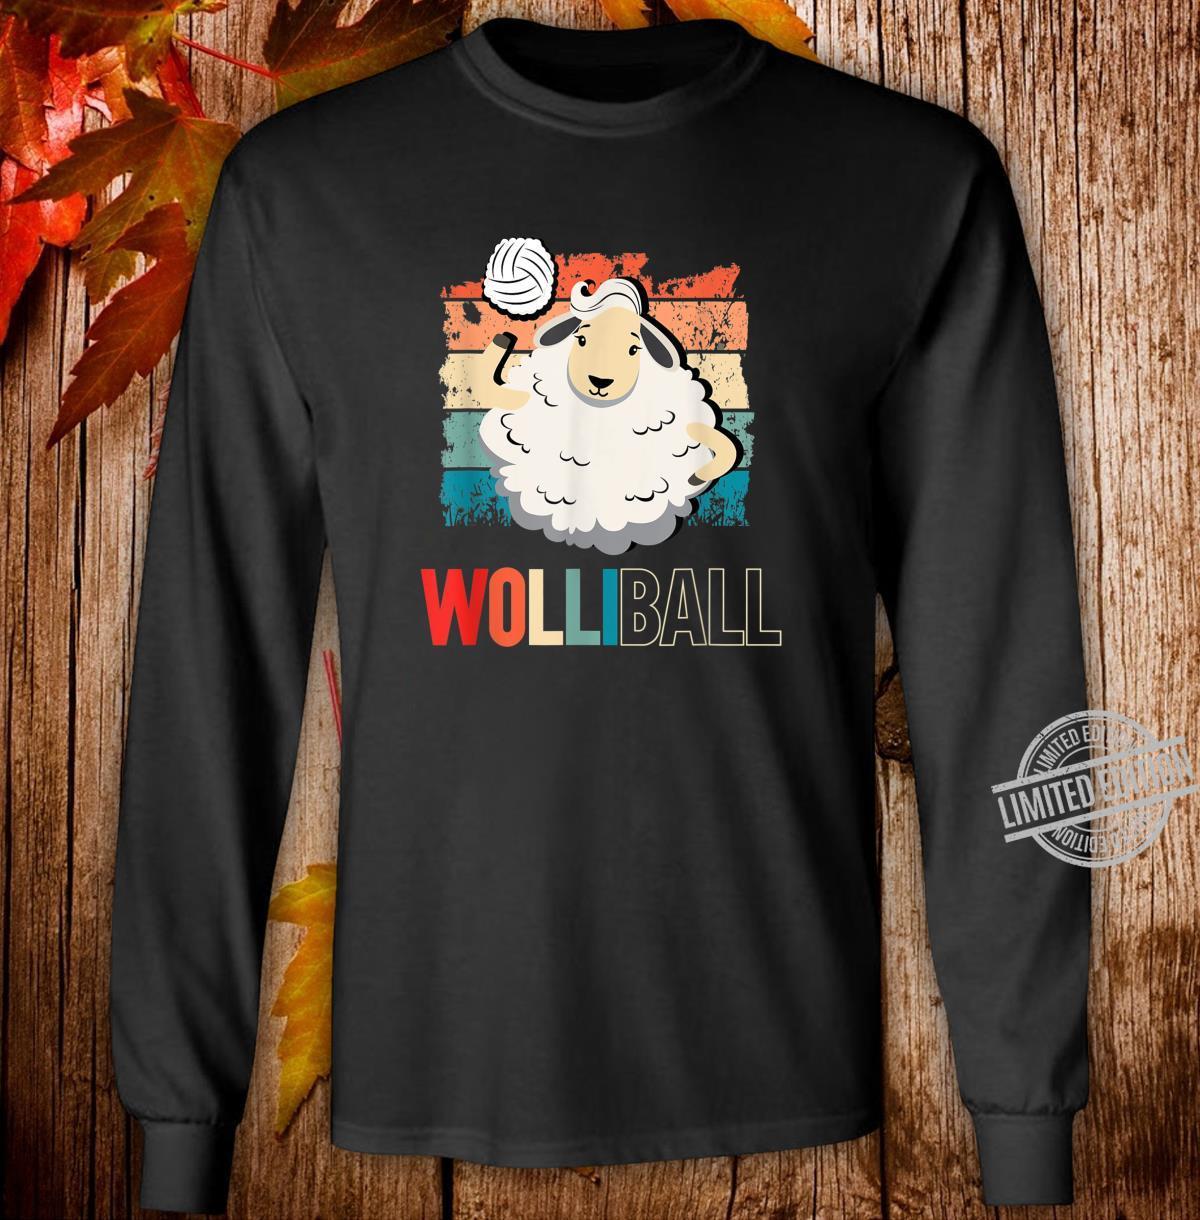 Wolliball Yolleyball Schaf Retro Spruch Motiv Shirt long sleeved